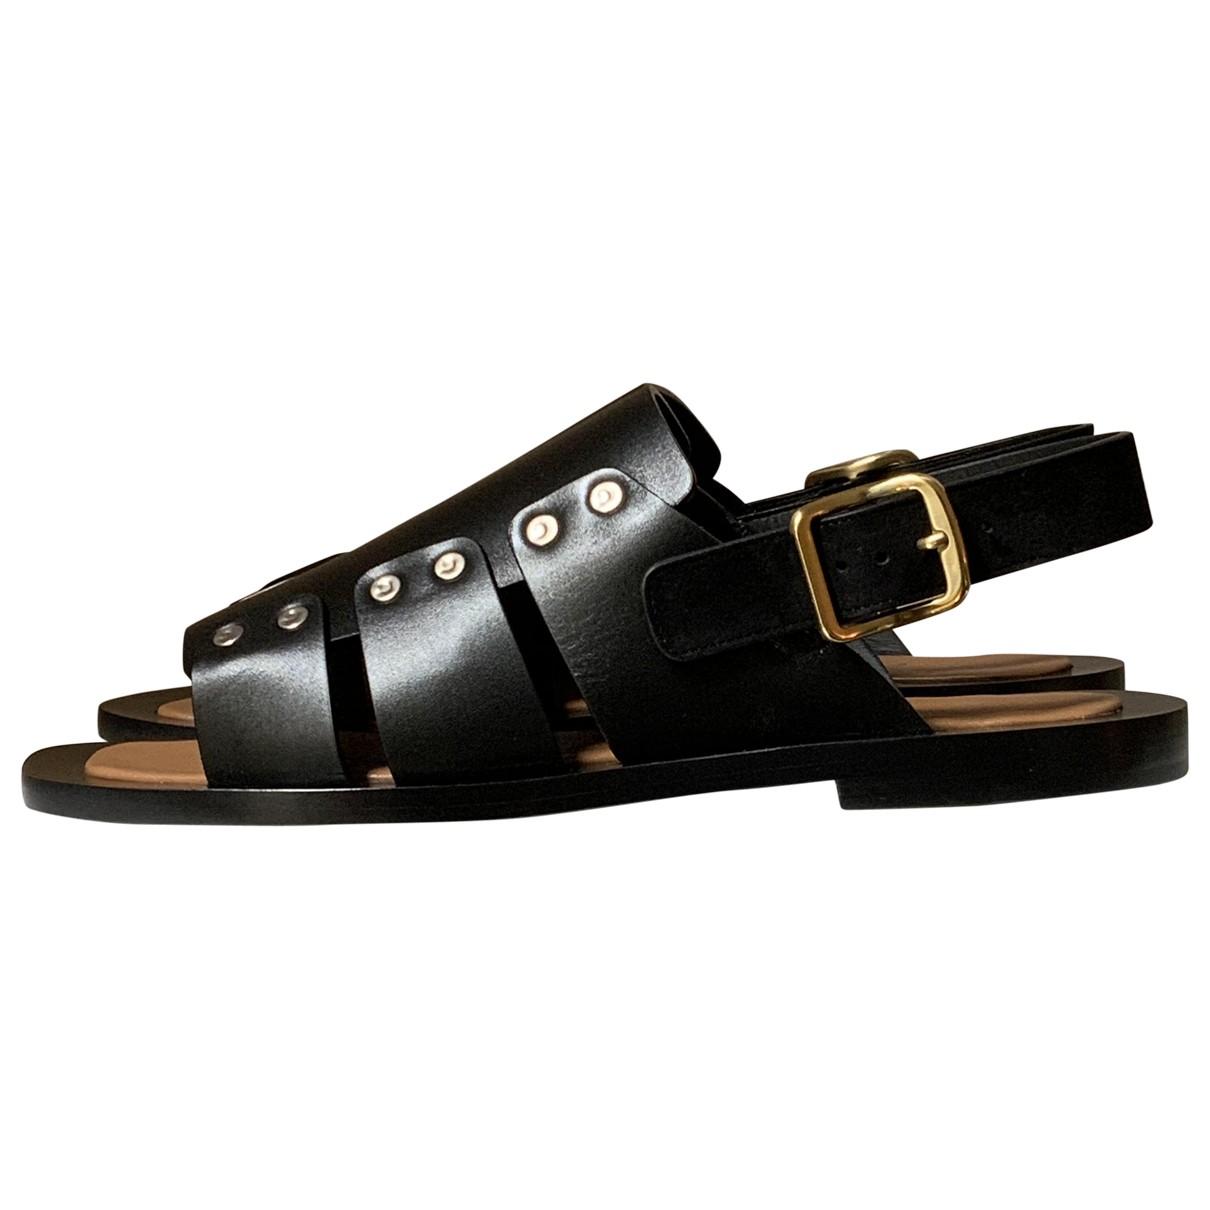 Celine \N Black Leather Sandals for Women 39 EU